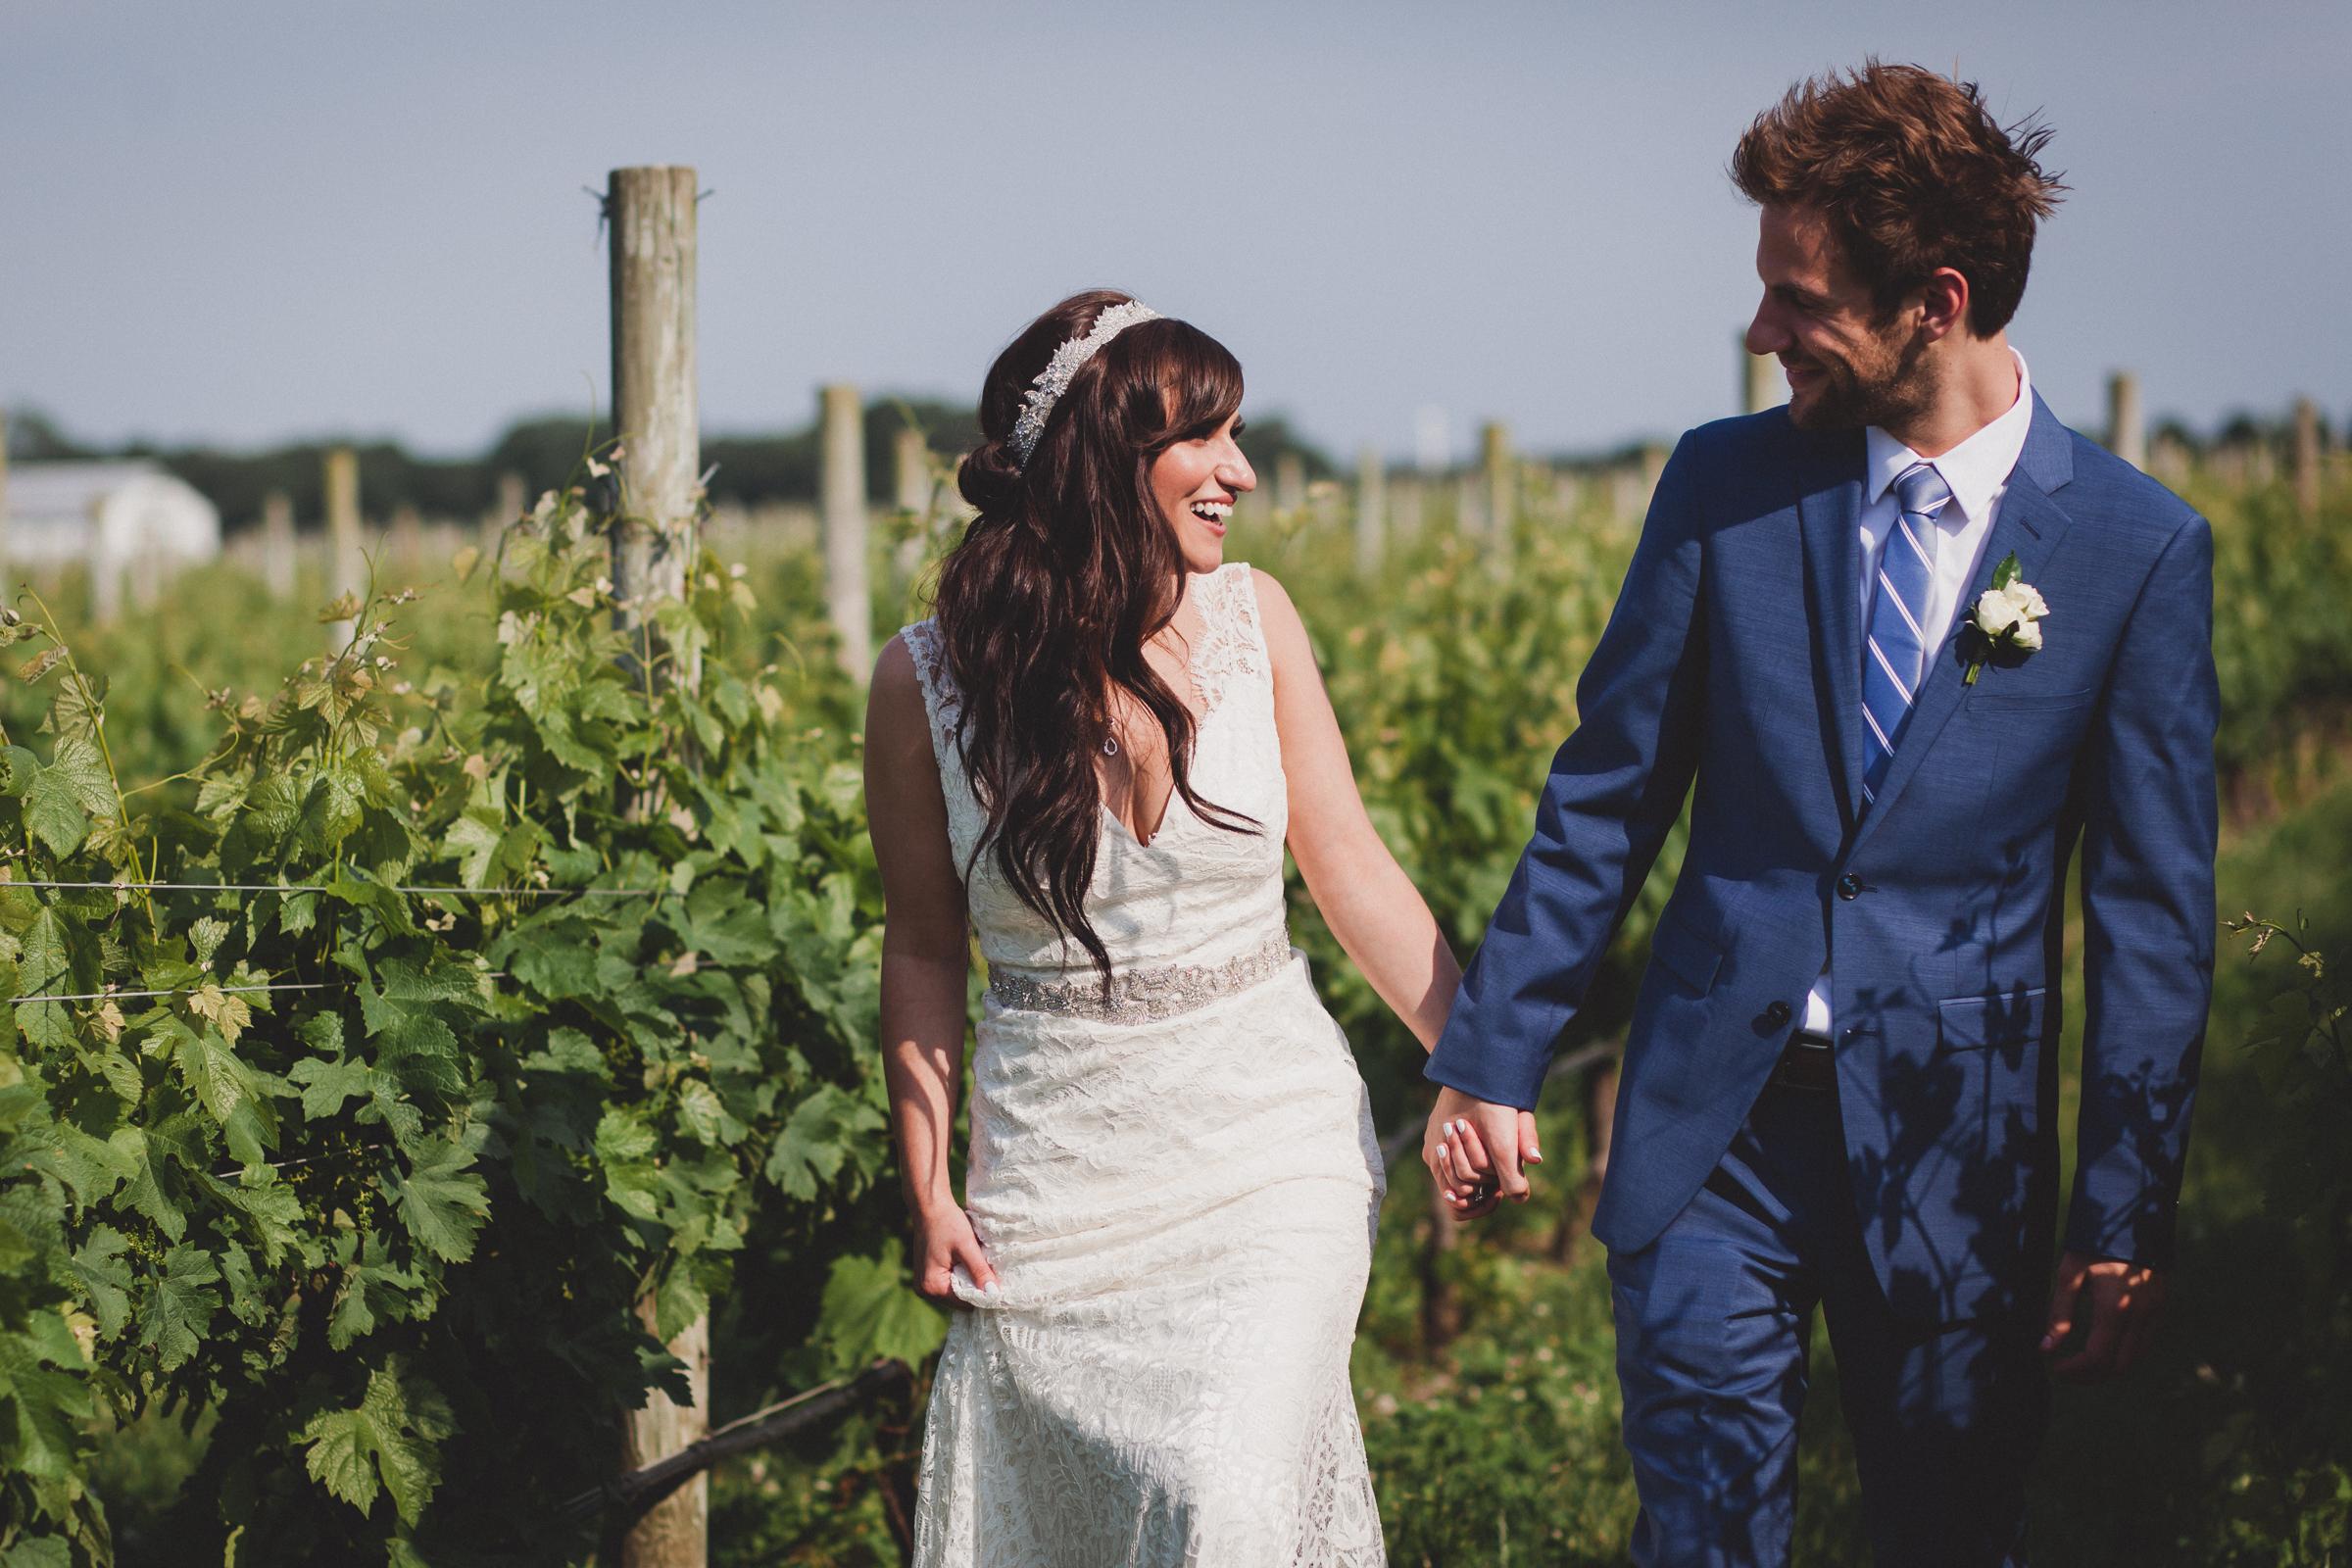 Martha-Clara-Vineyard-Long-Island-Documentary-Wedding-Photographer-32.jpg